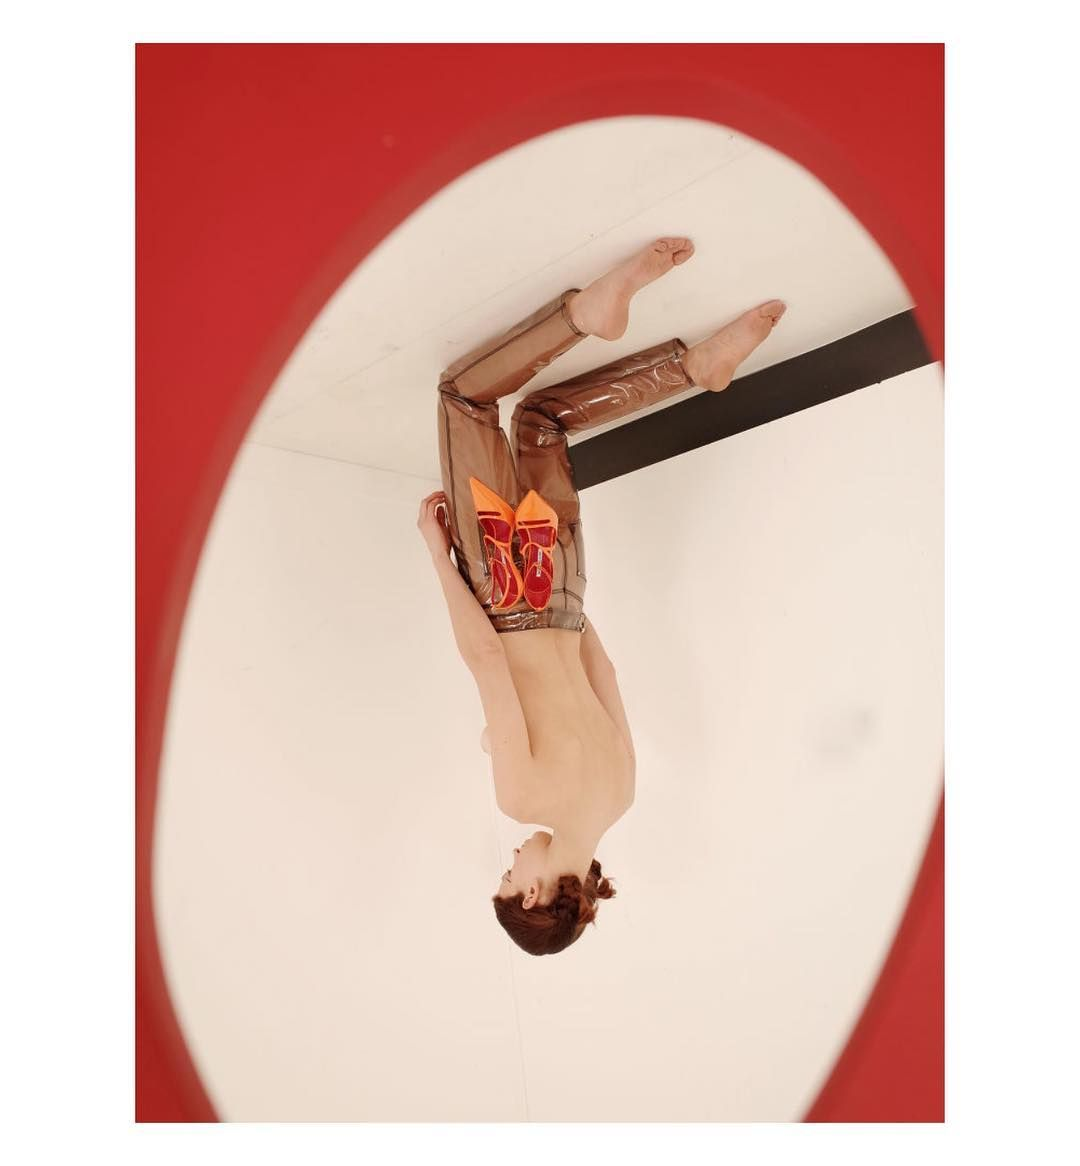 Agnes Lloyd-Platt @agnesvita #dailyinspiration #thursday  #dltd_scenes #Magazine #onlinemagazine #publication #fashion #mode #beauty #editorial #photography #photoshoot #photography #stilllife #stilleben #stilllifephotography #setdesign #setdesigner #props #installation #stockholm #sweden #sverige #scandinavian #norden #instaphotos